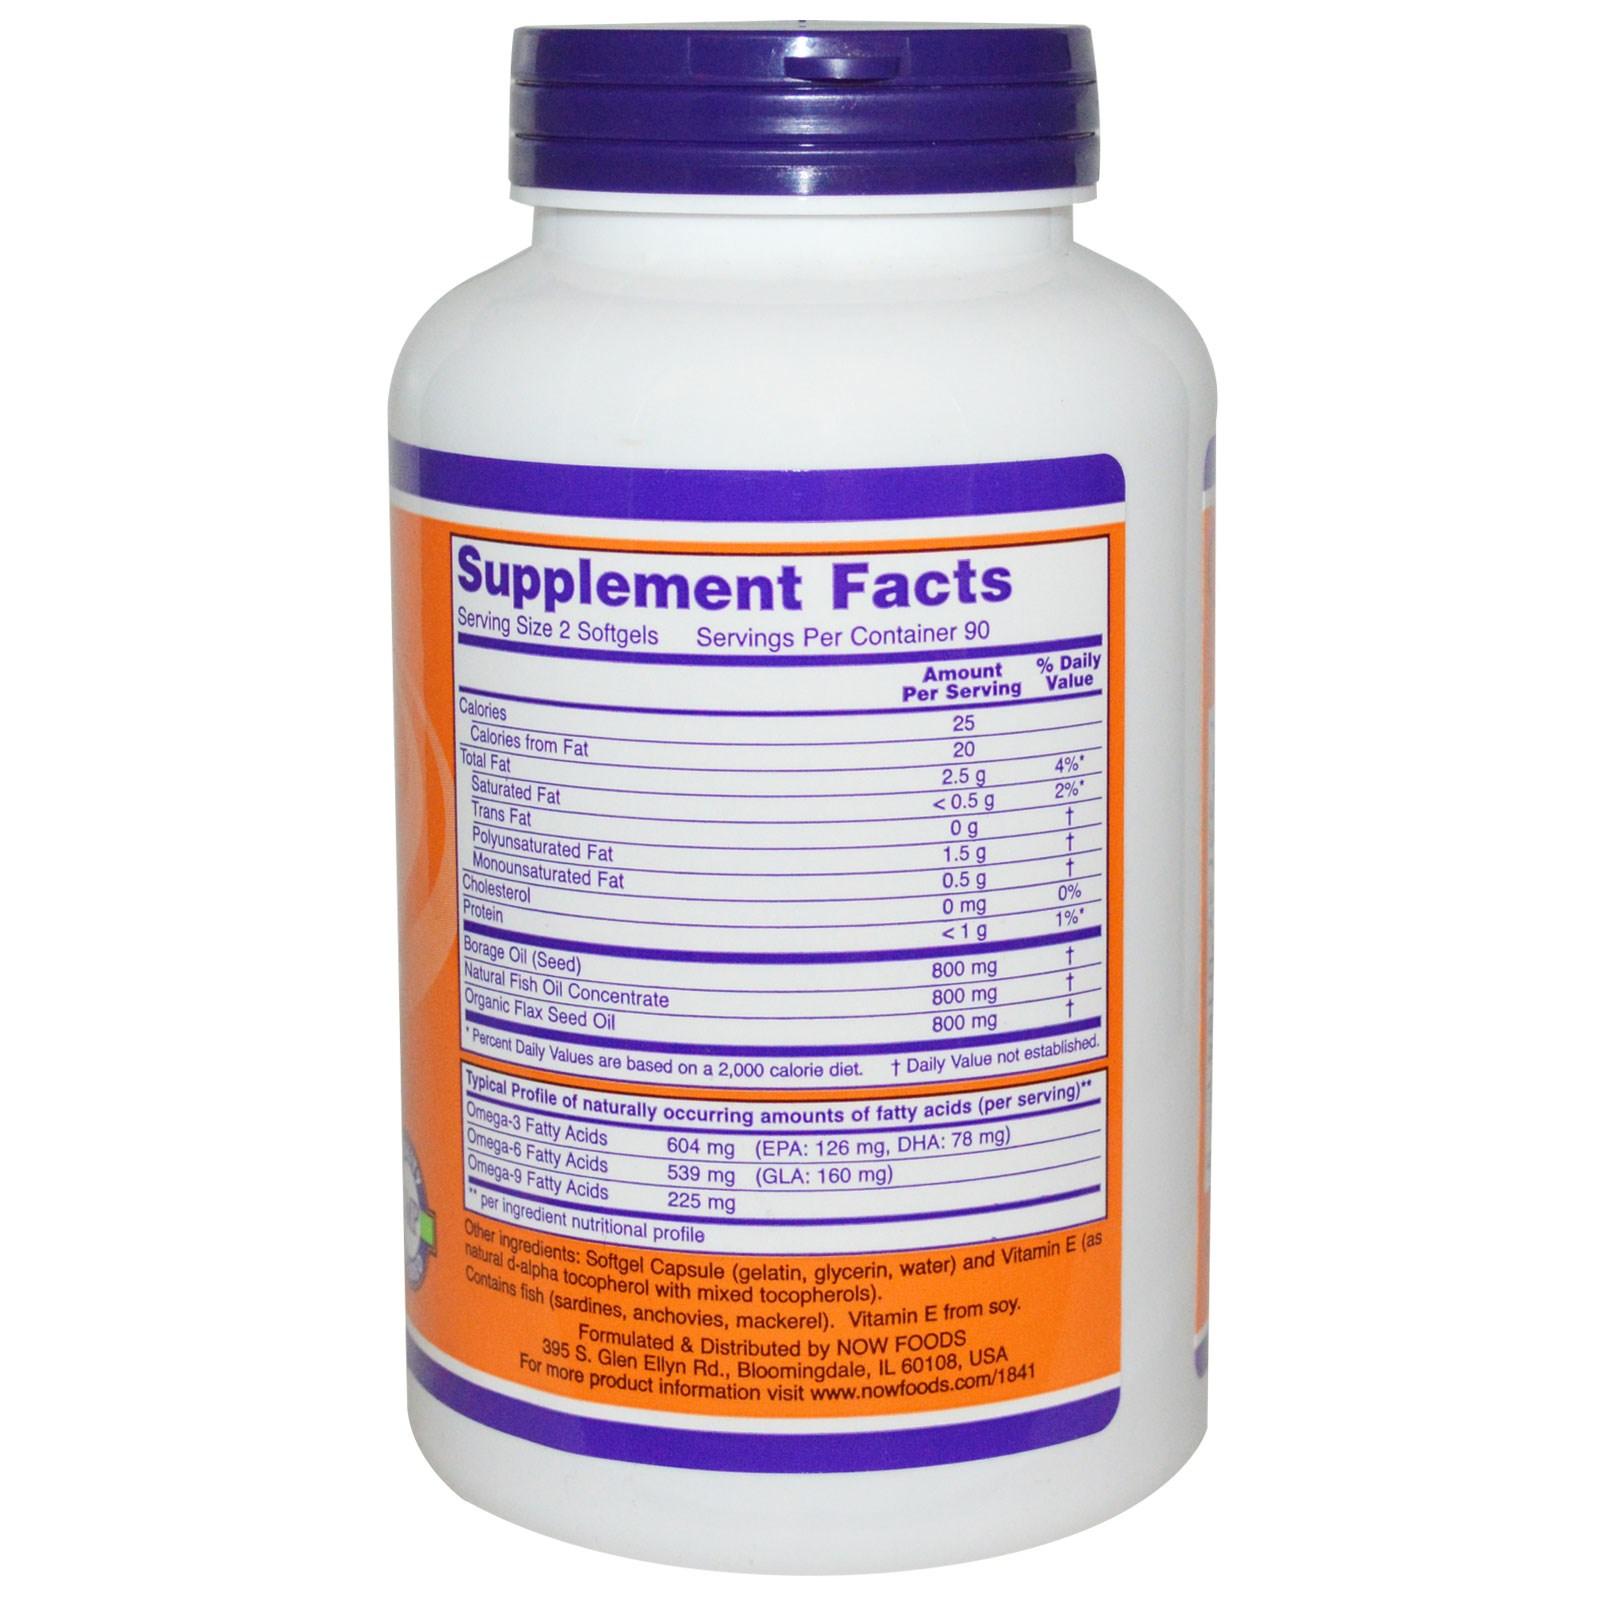 Super Omega 3 6 9 1200 Mg 180 Softgels Now Foods Healthy Care 369 200 Caps